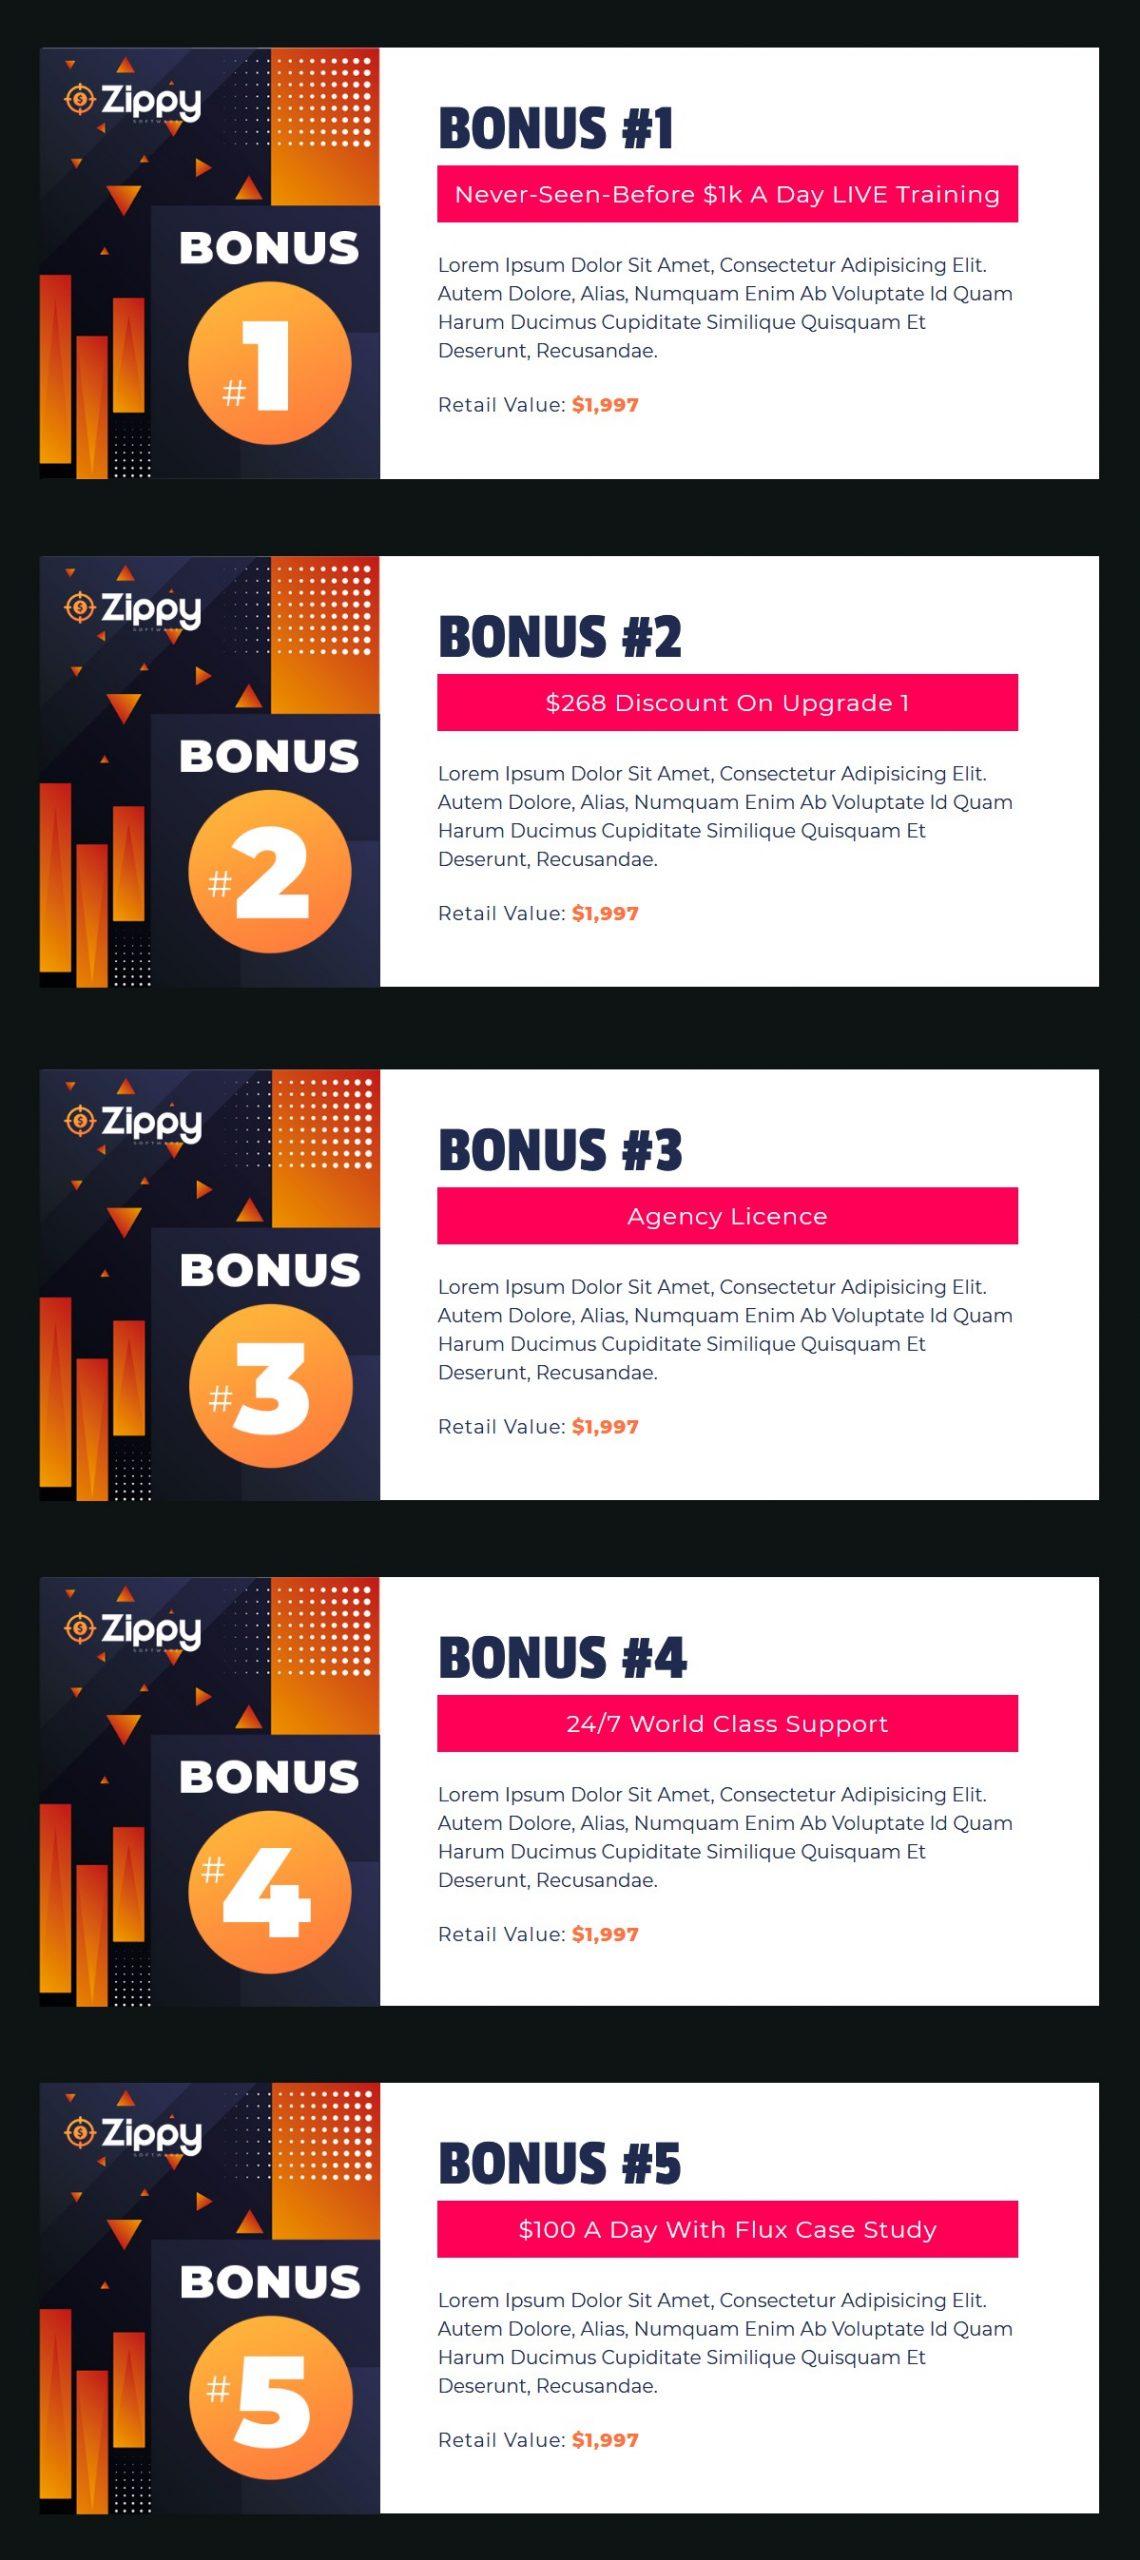 Zippy-bonus-2